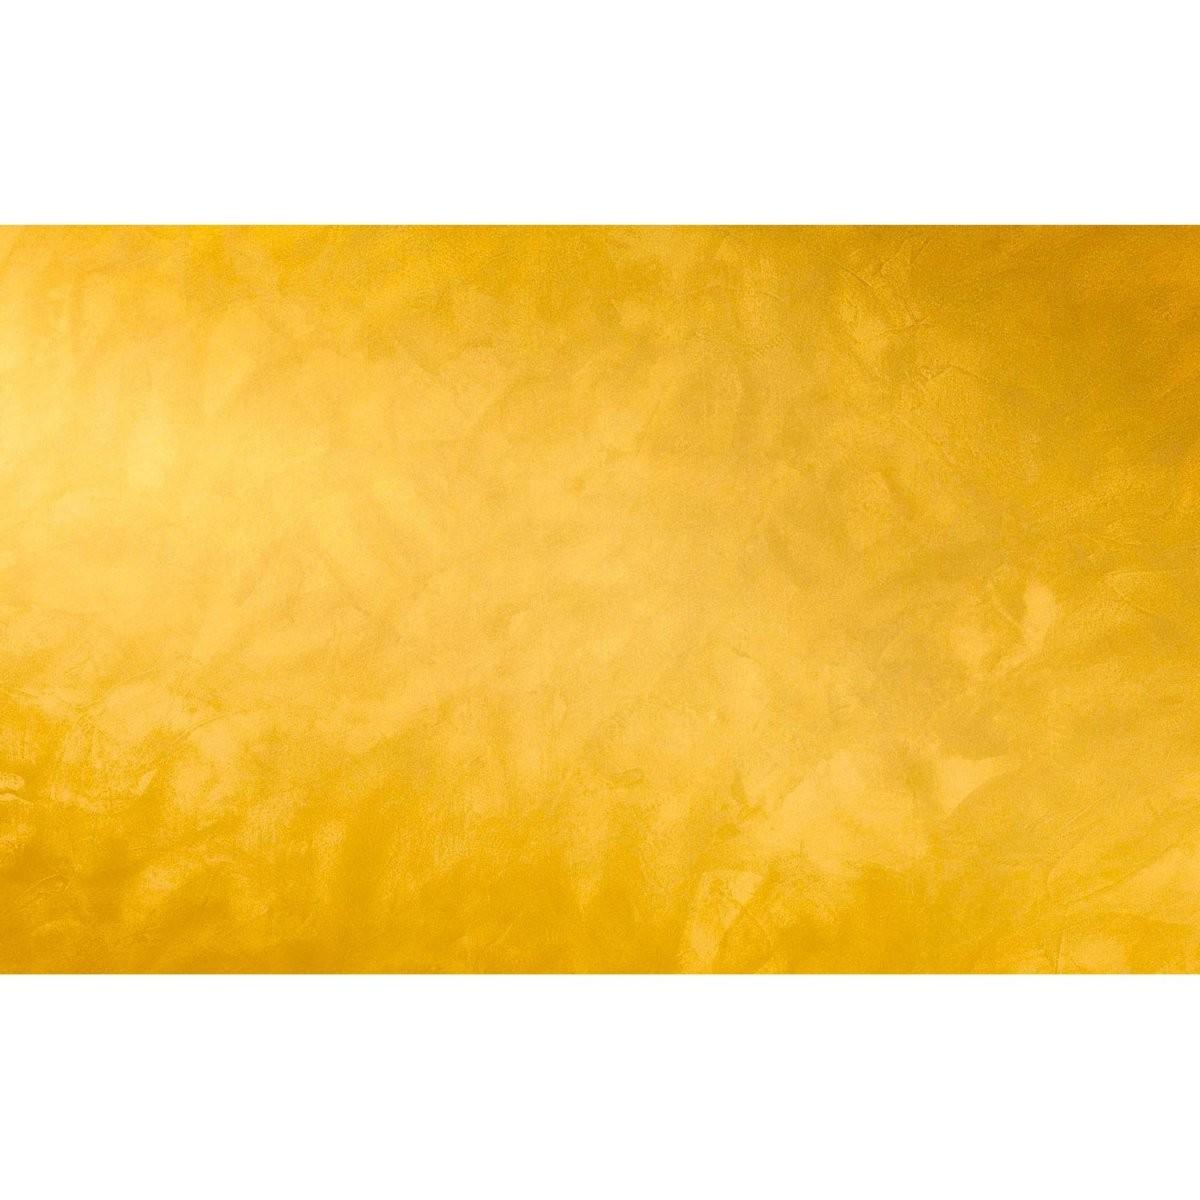 Alpina Farbrezepte Goldeffekt Gold Kaufen Bei Obi von Wandfarbe Gold Farbe Wandgestaltung Bild